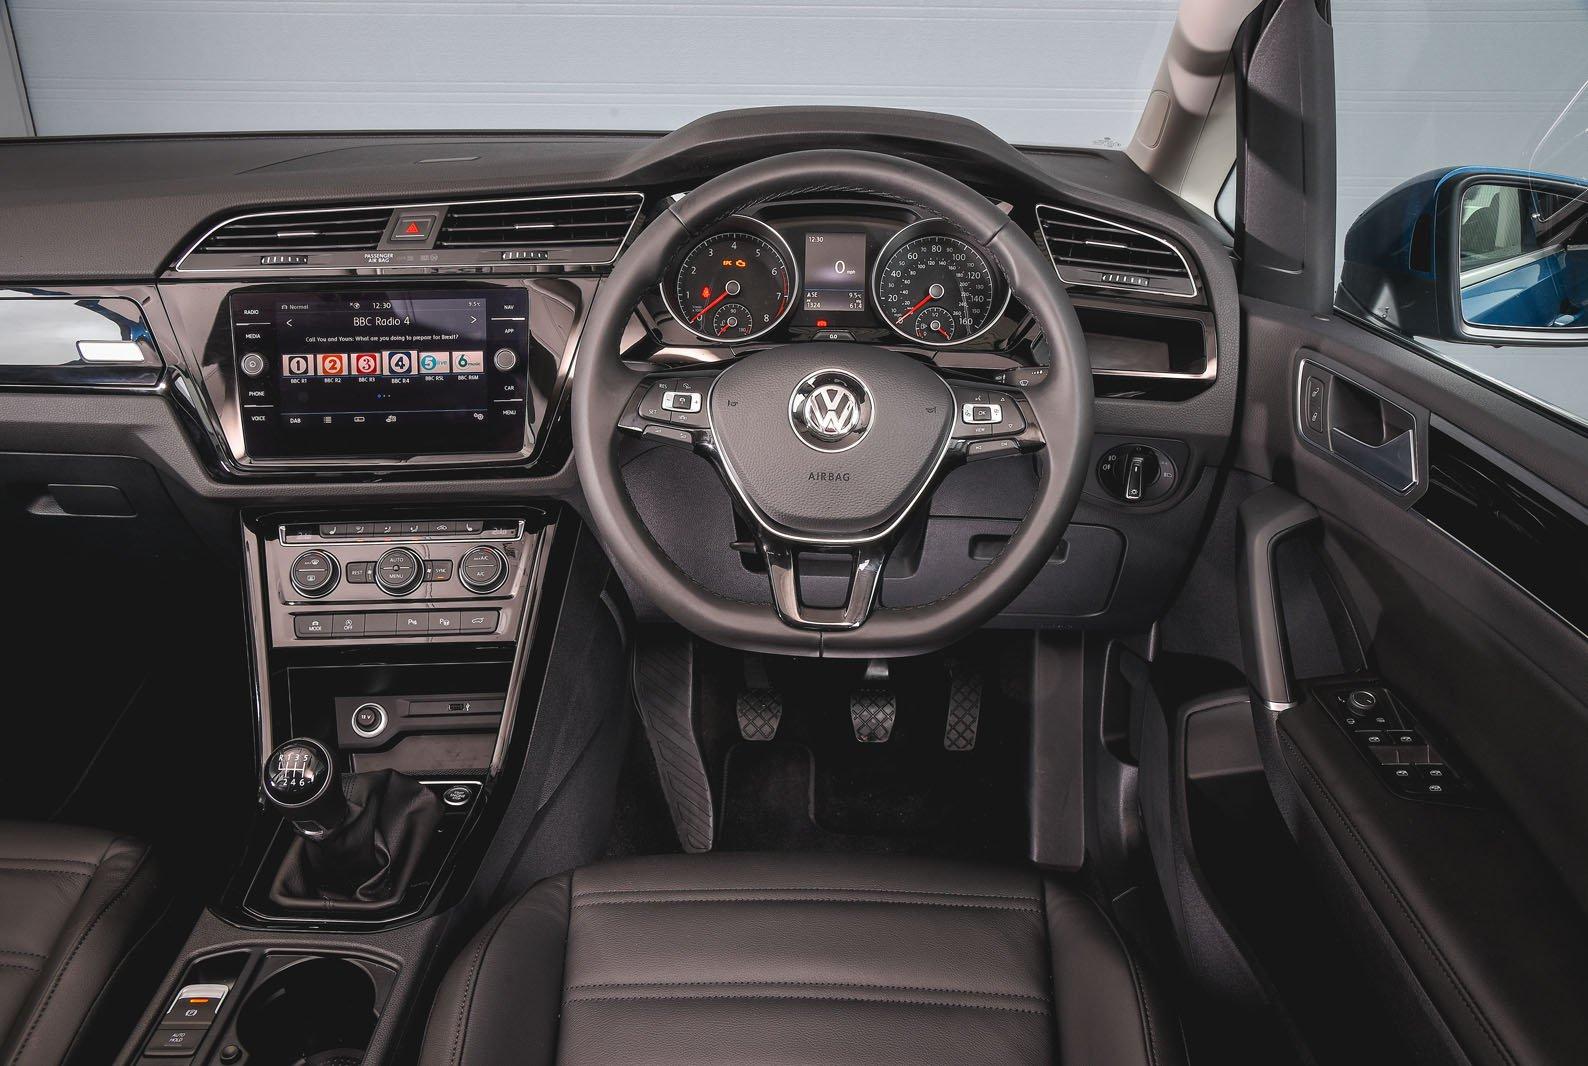 Volkswagen Touran 1.6 TDI 115 SE Family - interior